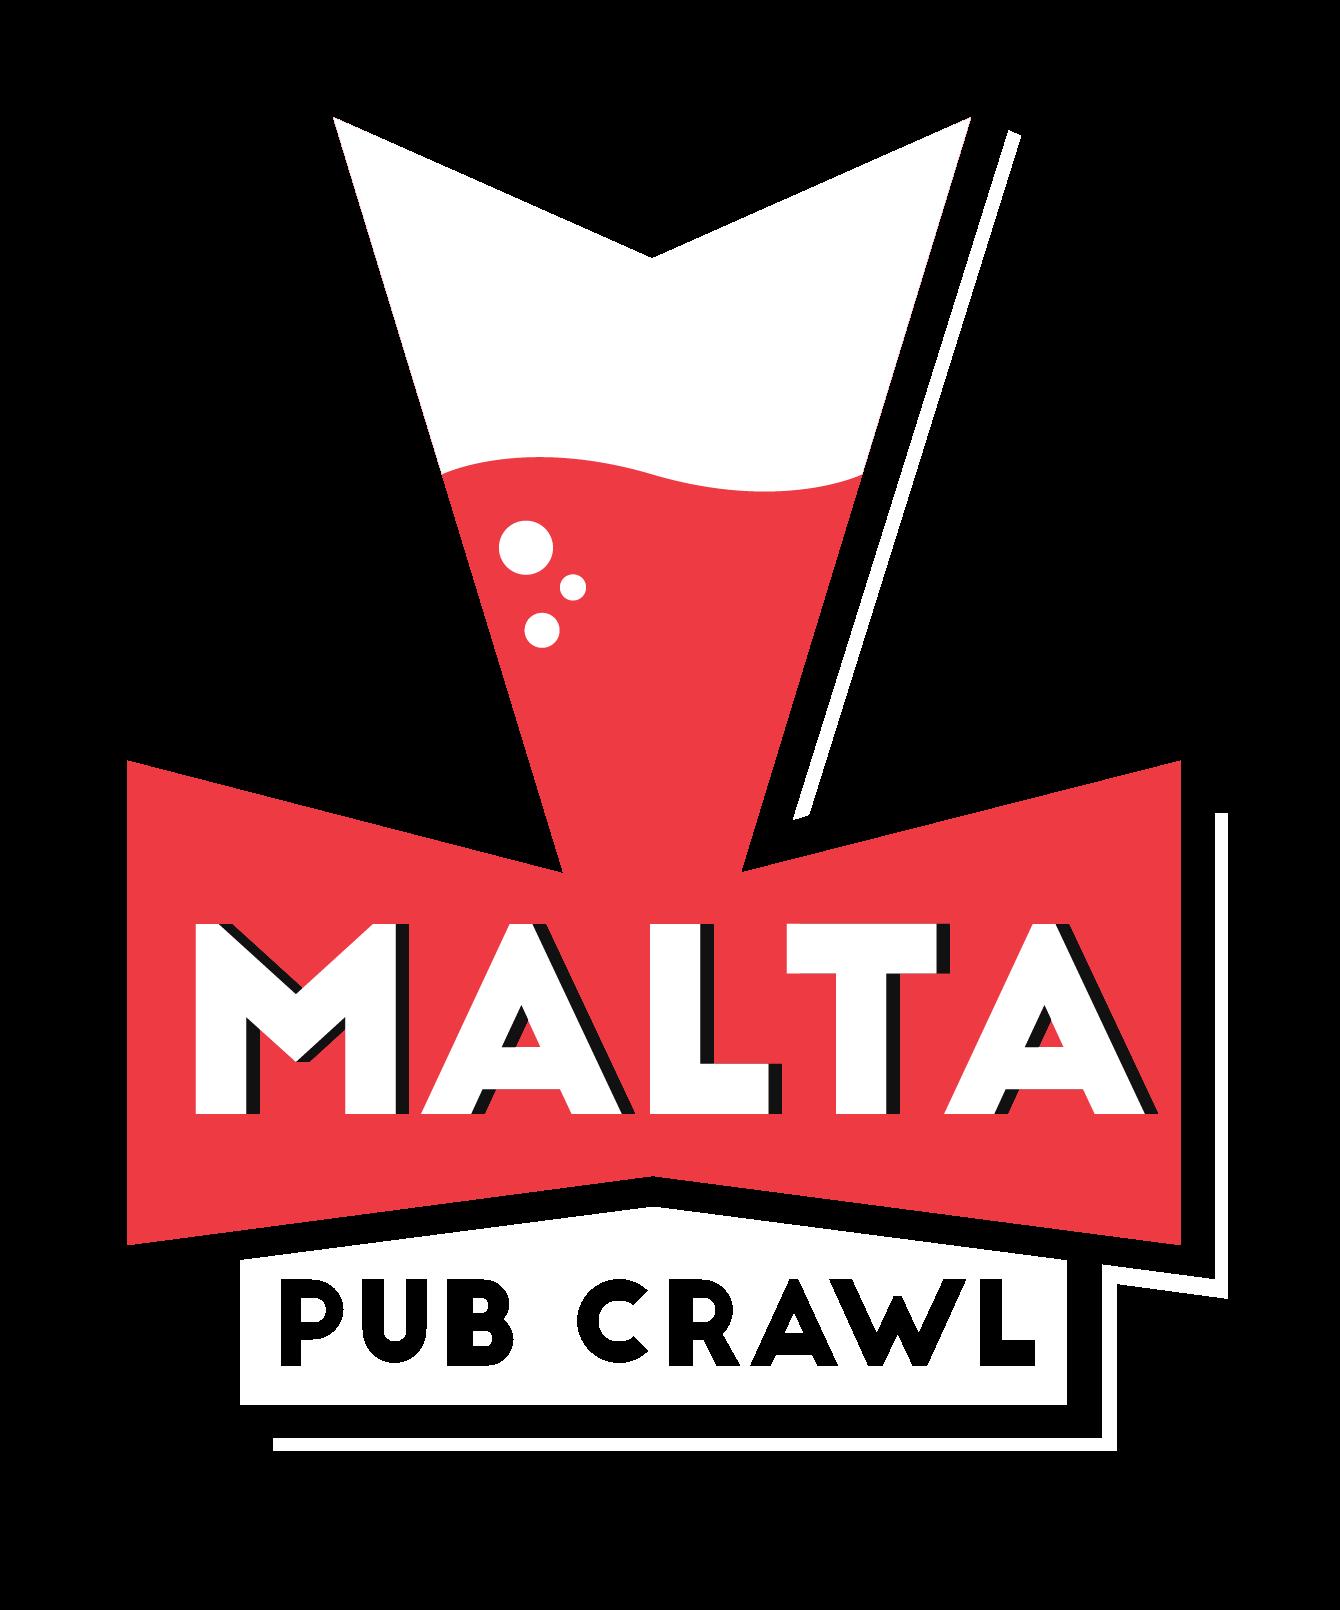 Malta Pub Crawl footer logo